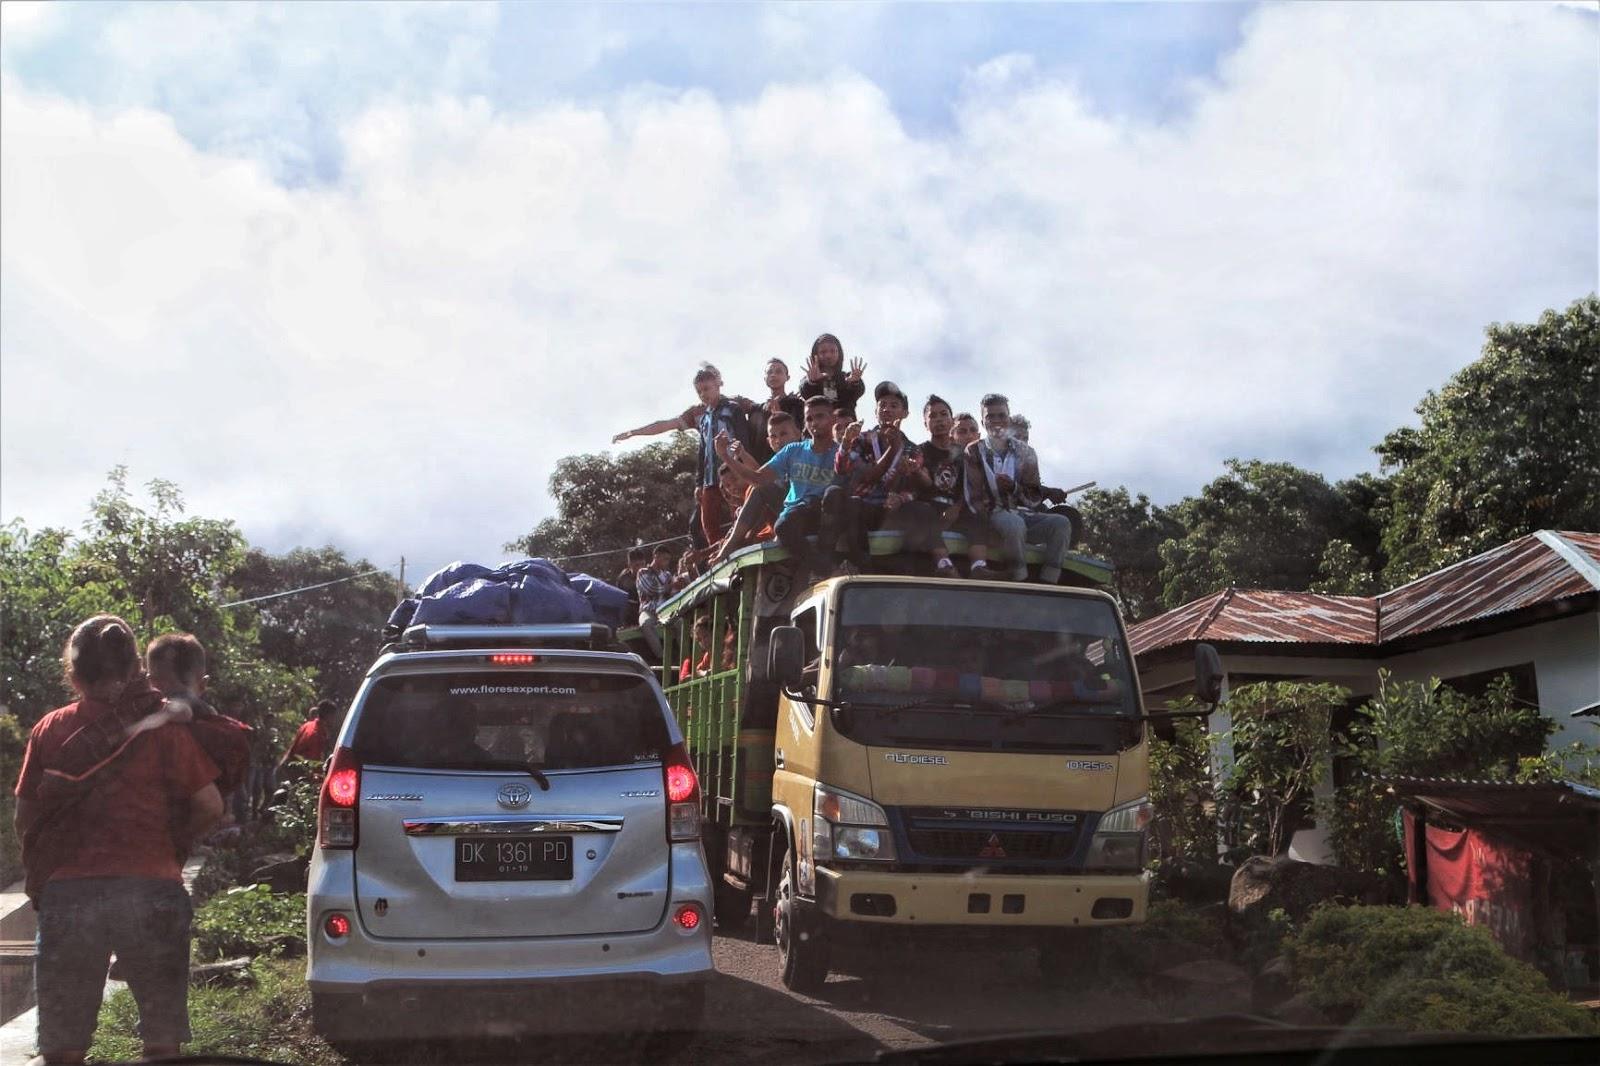 Transportasi umum masyarakat hanya lori/truk yang datang tidak tiap hari dan tidak ada angkot